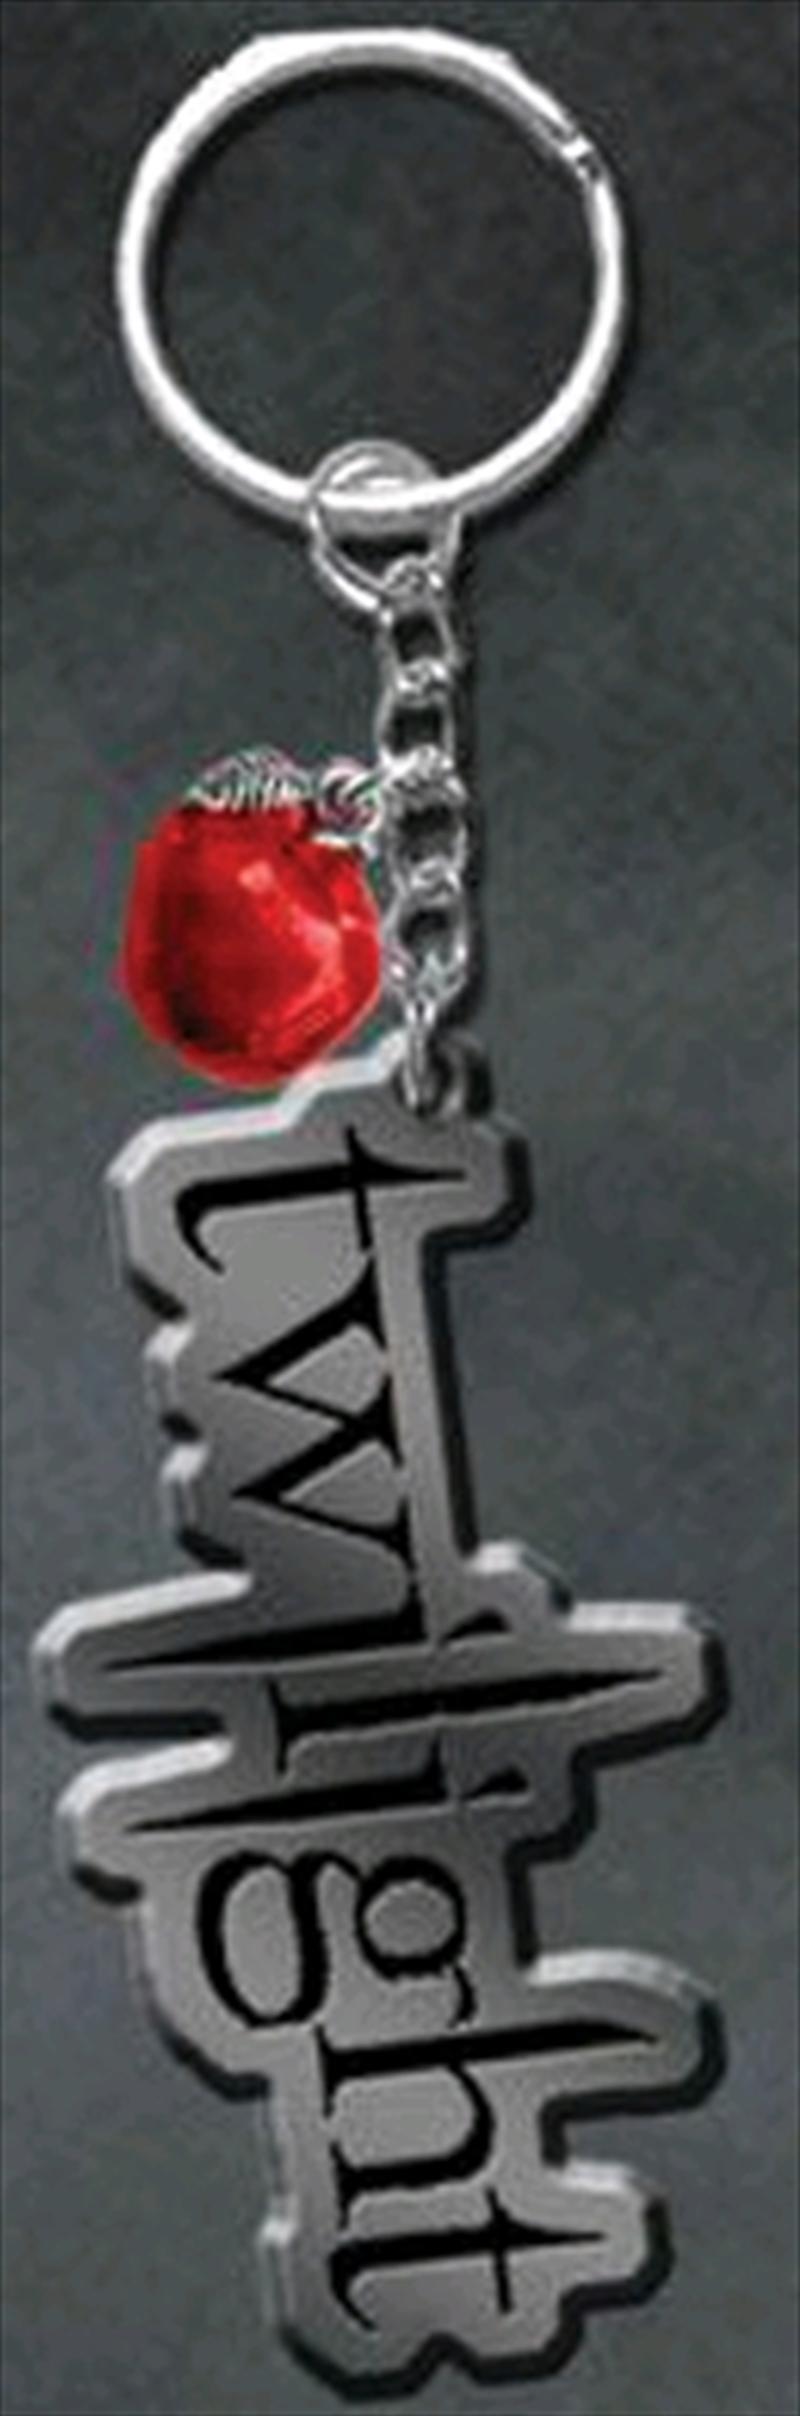 Twilight - Key Ring Logo   Accessories